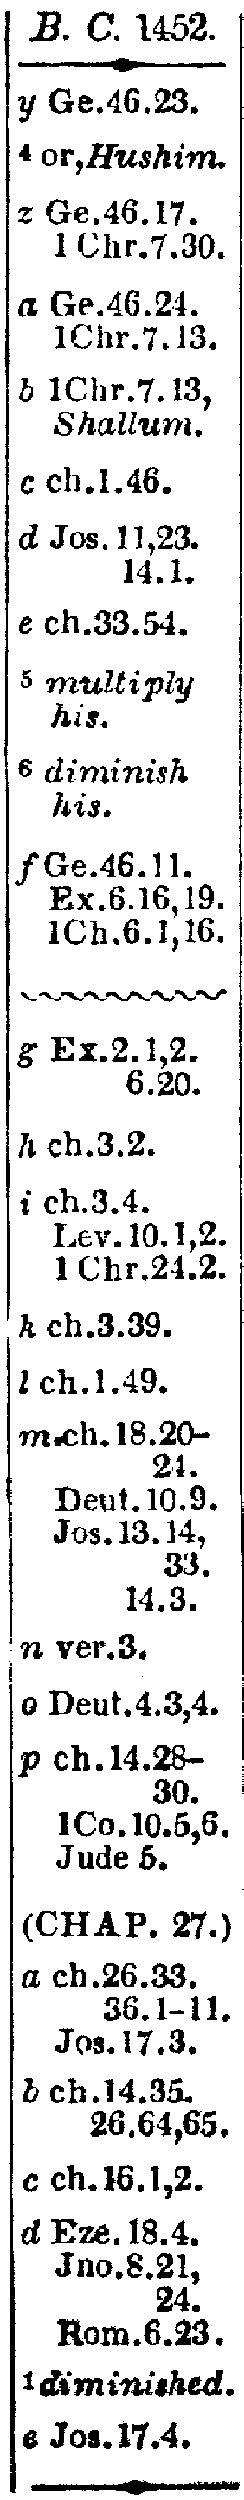 [merged small][ocr errors][ocr errors][ocr errors][ocr errors][merged small][ocr errors][merged small][ocr errors][ocr errors][merged small][merged small][merged small][merged small][merged small][ocr errors]